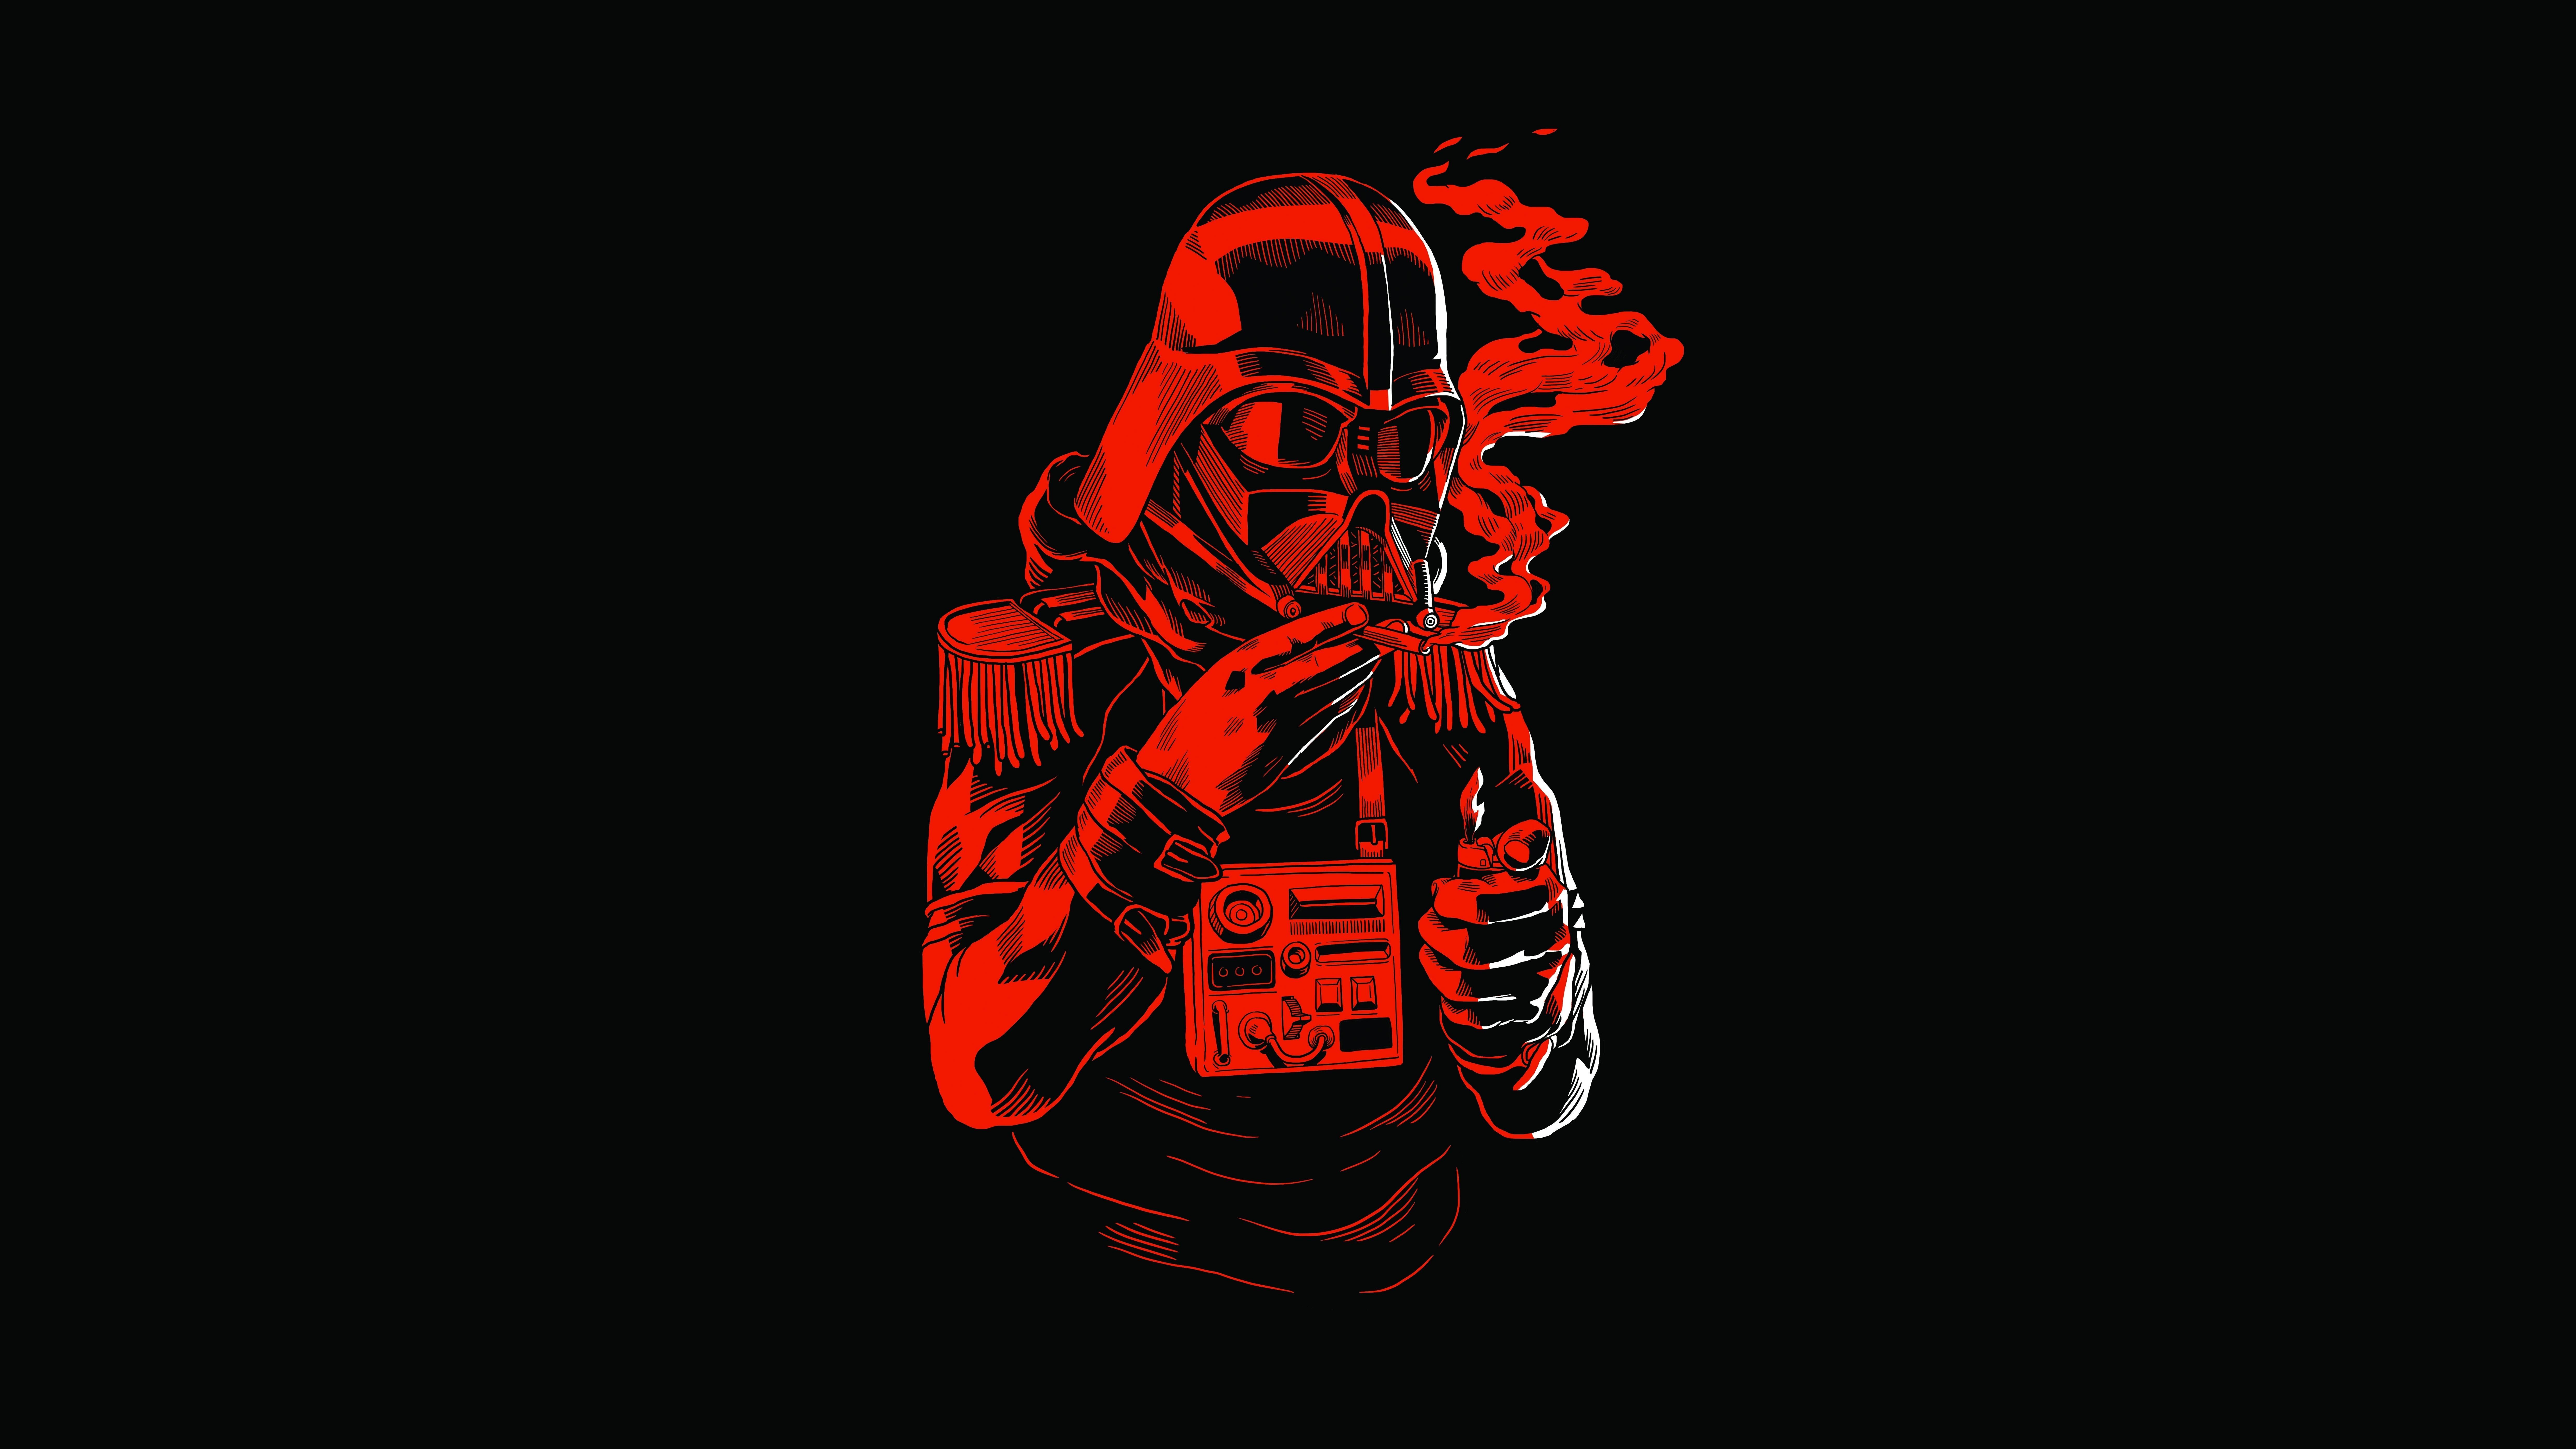 Wallpapers Star Wars Posted By Samantha Mercado